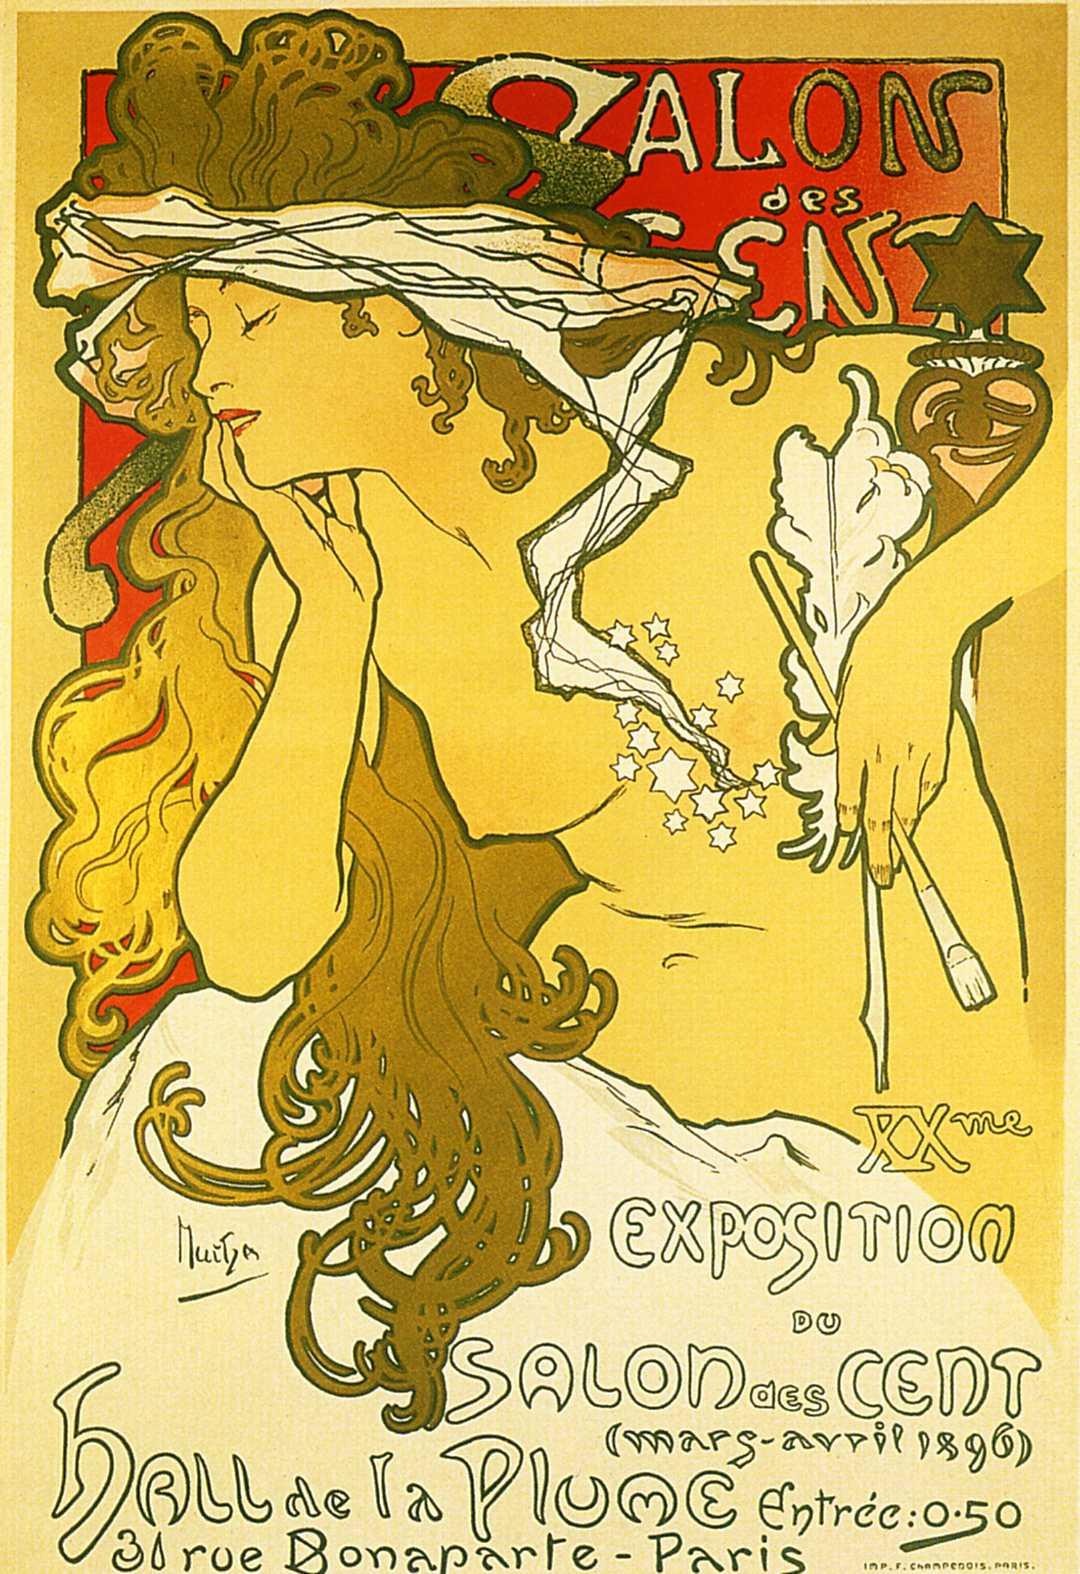 Афиша выставки в 'Салоне ста'-1896